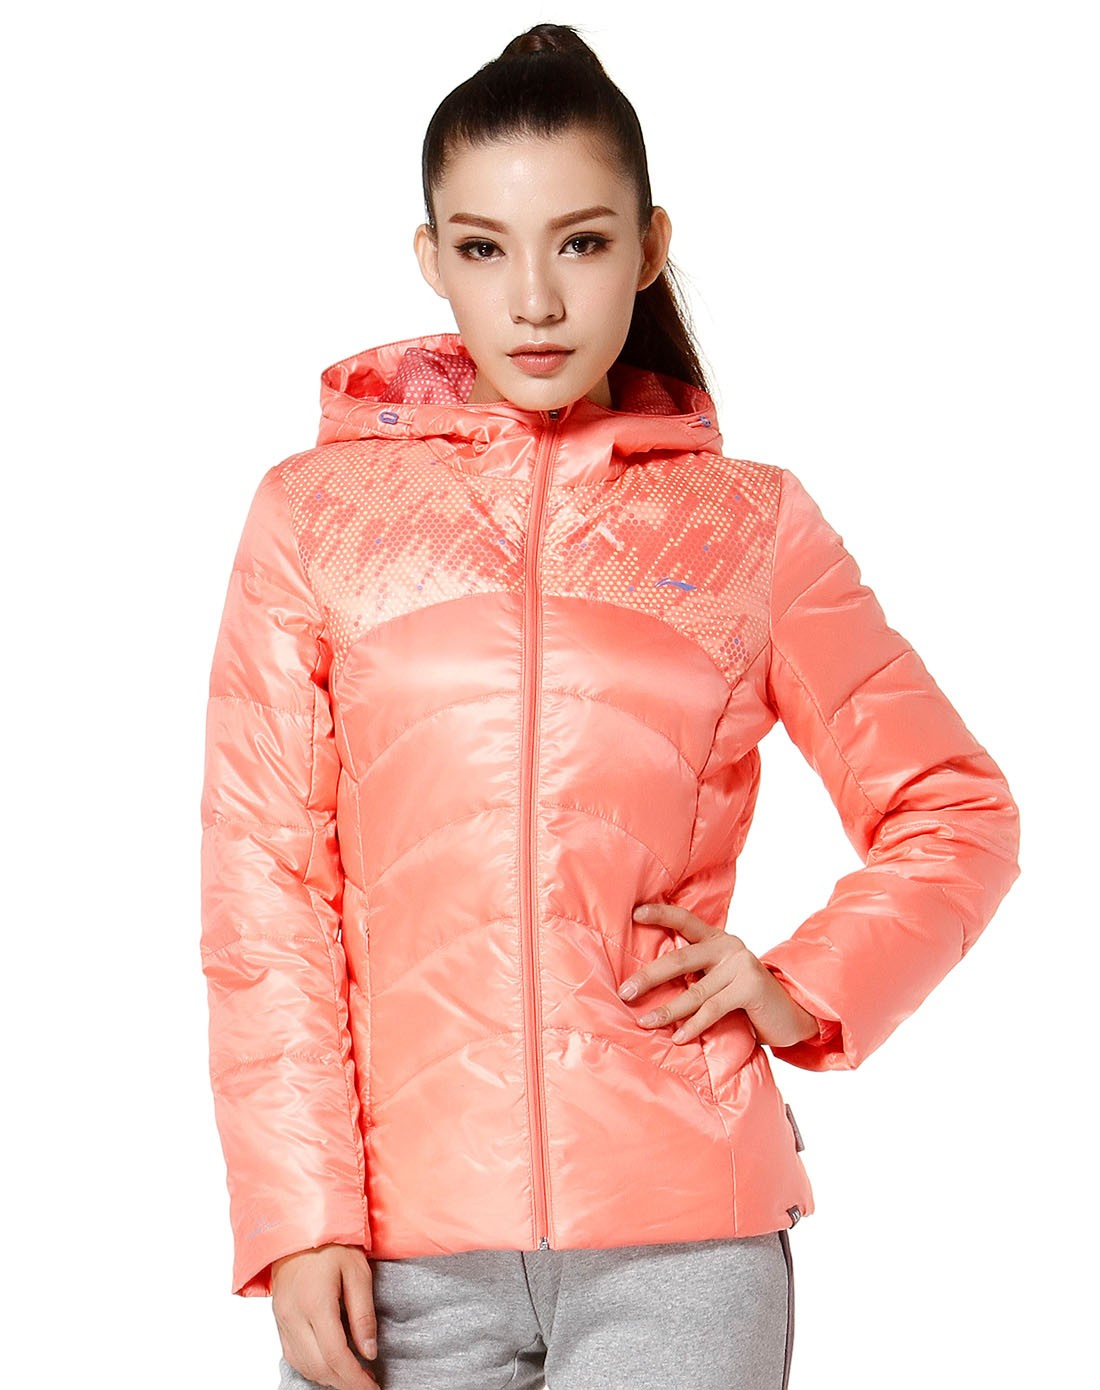 Manteau de sport femme LINING AYMH026-1 - Ref 505531 Image 6